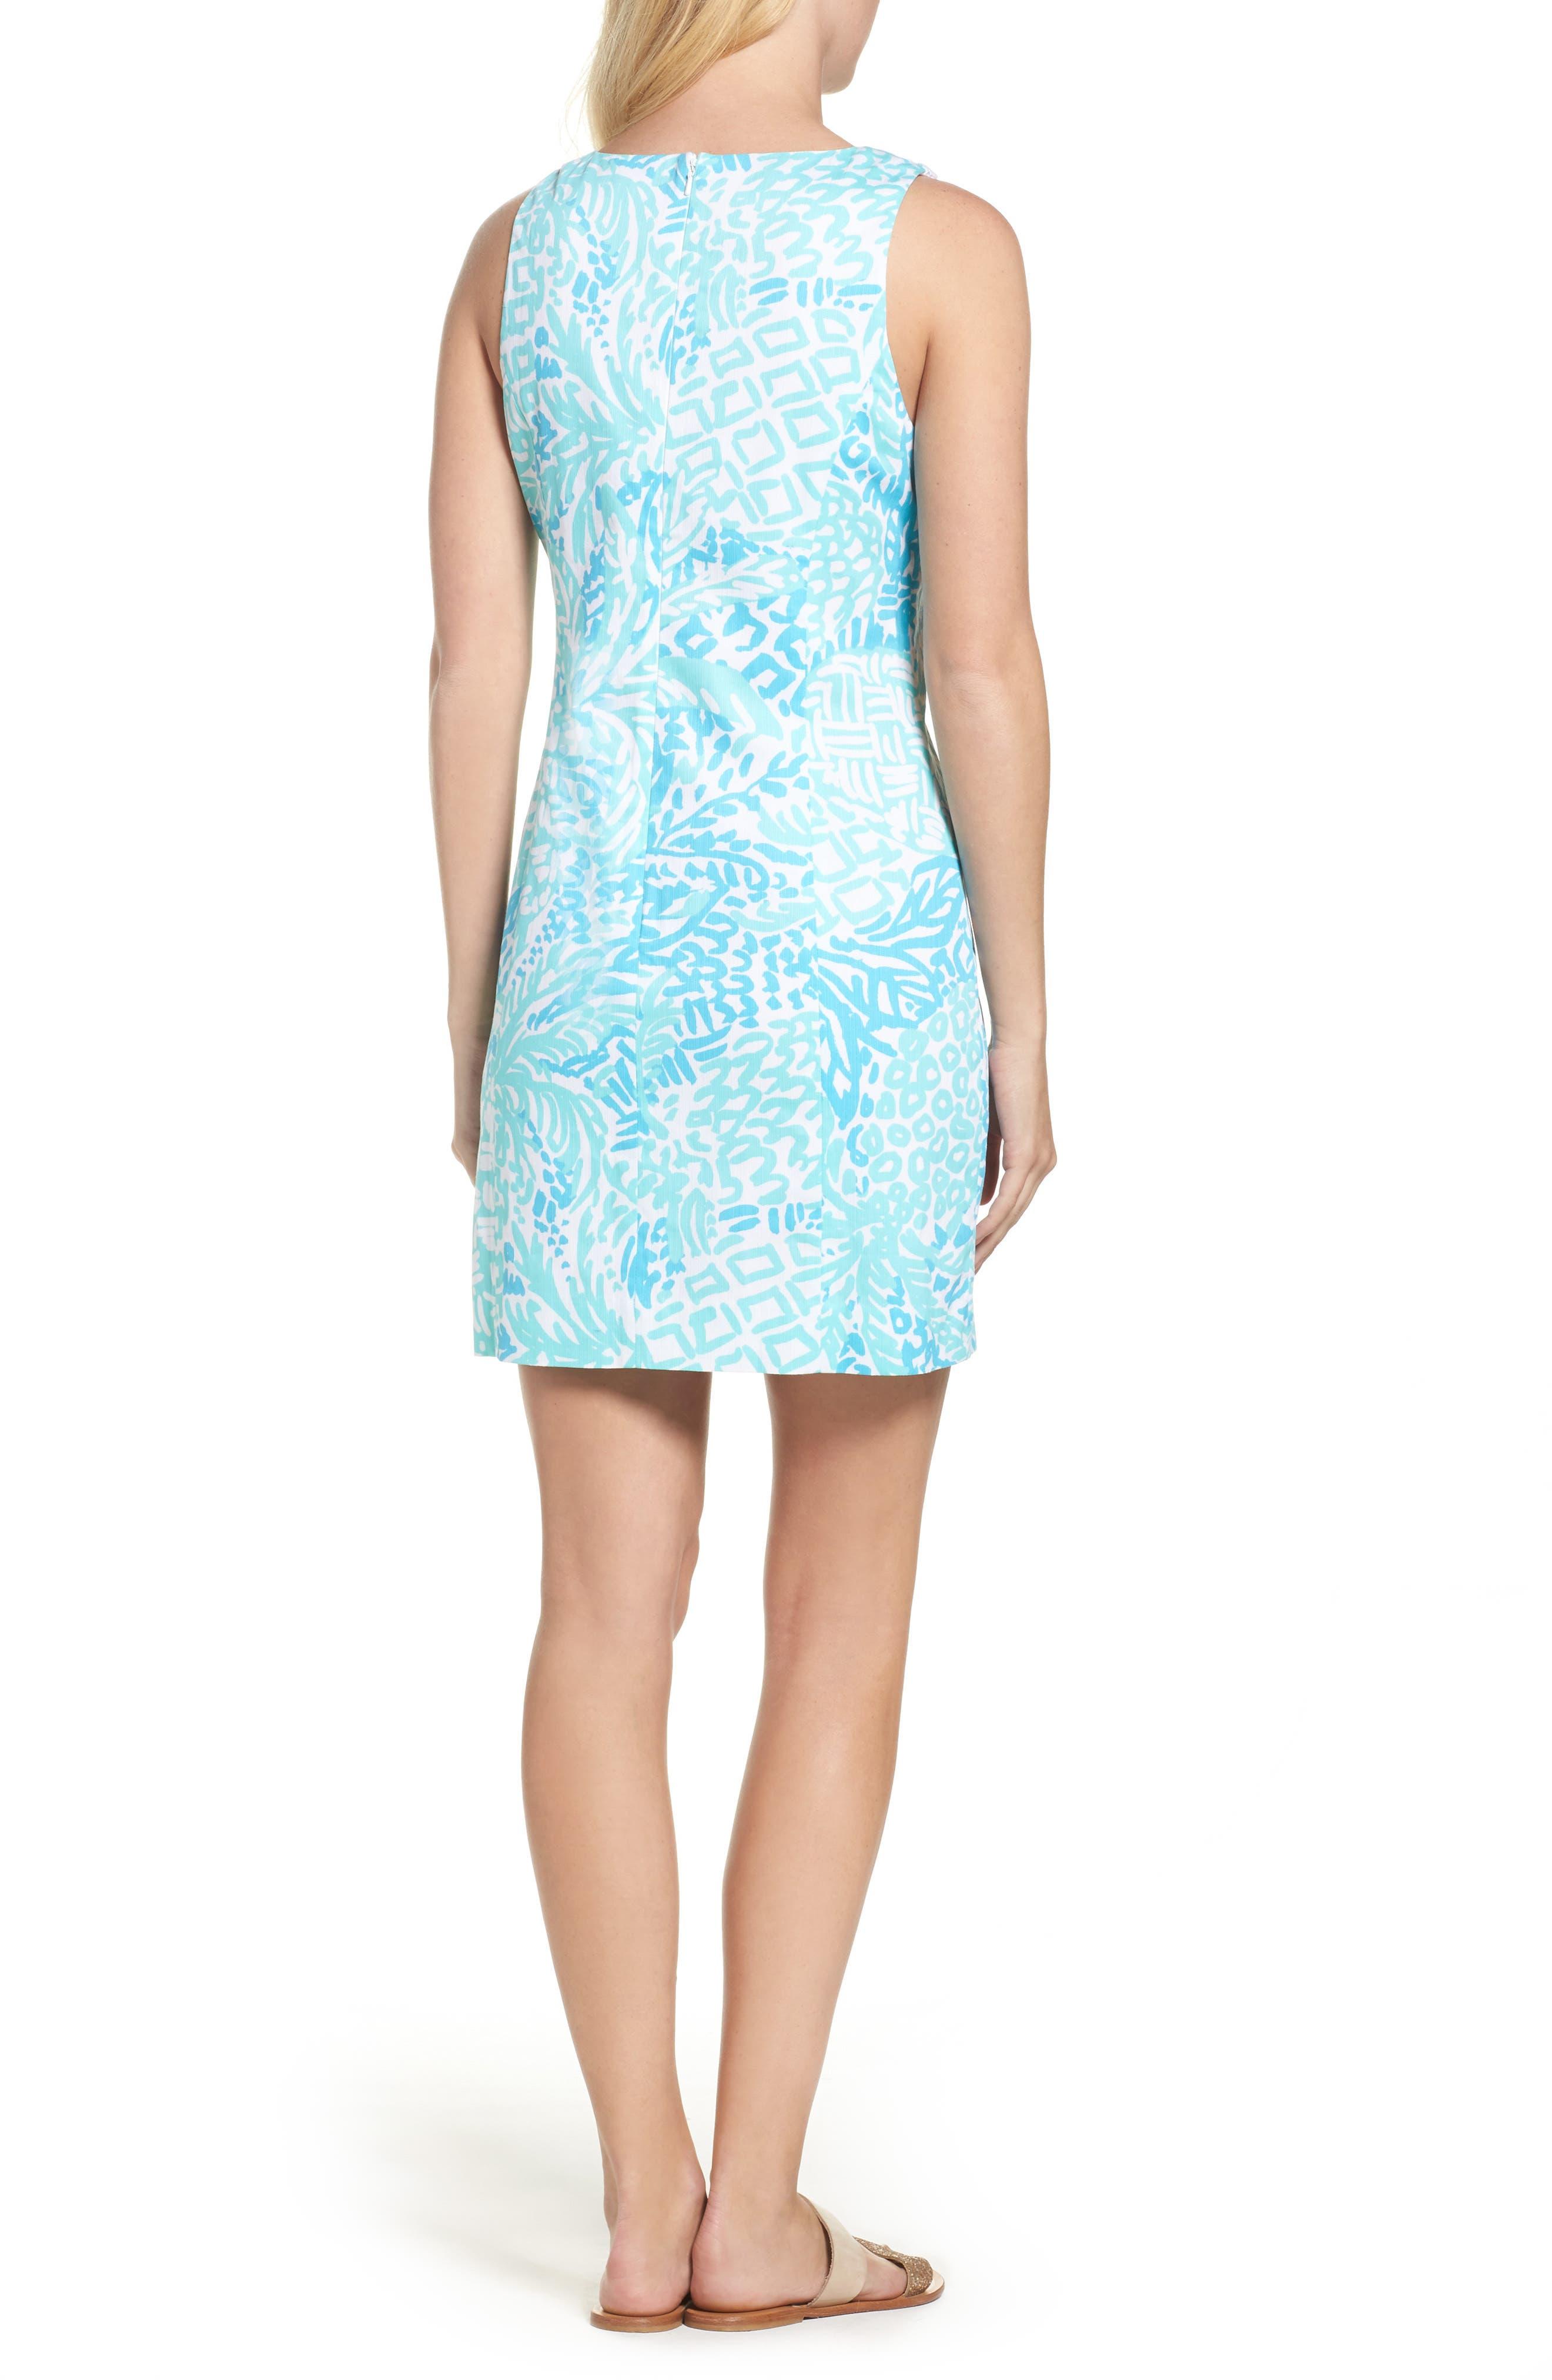 McFarlane Sheath dress,                             Alternate thumbnail 2, color,                             436